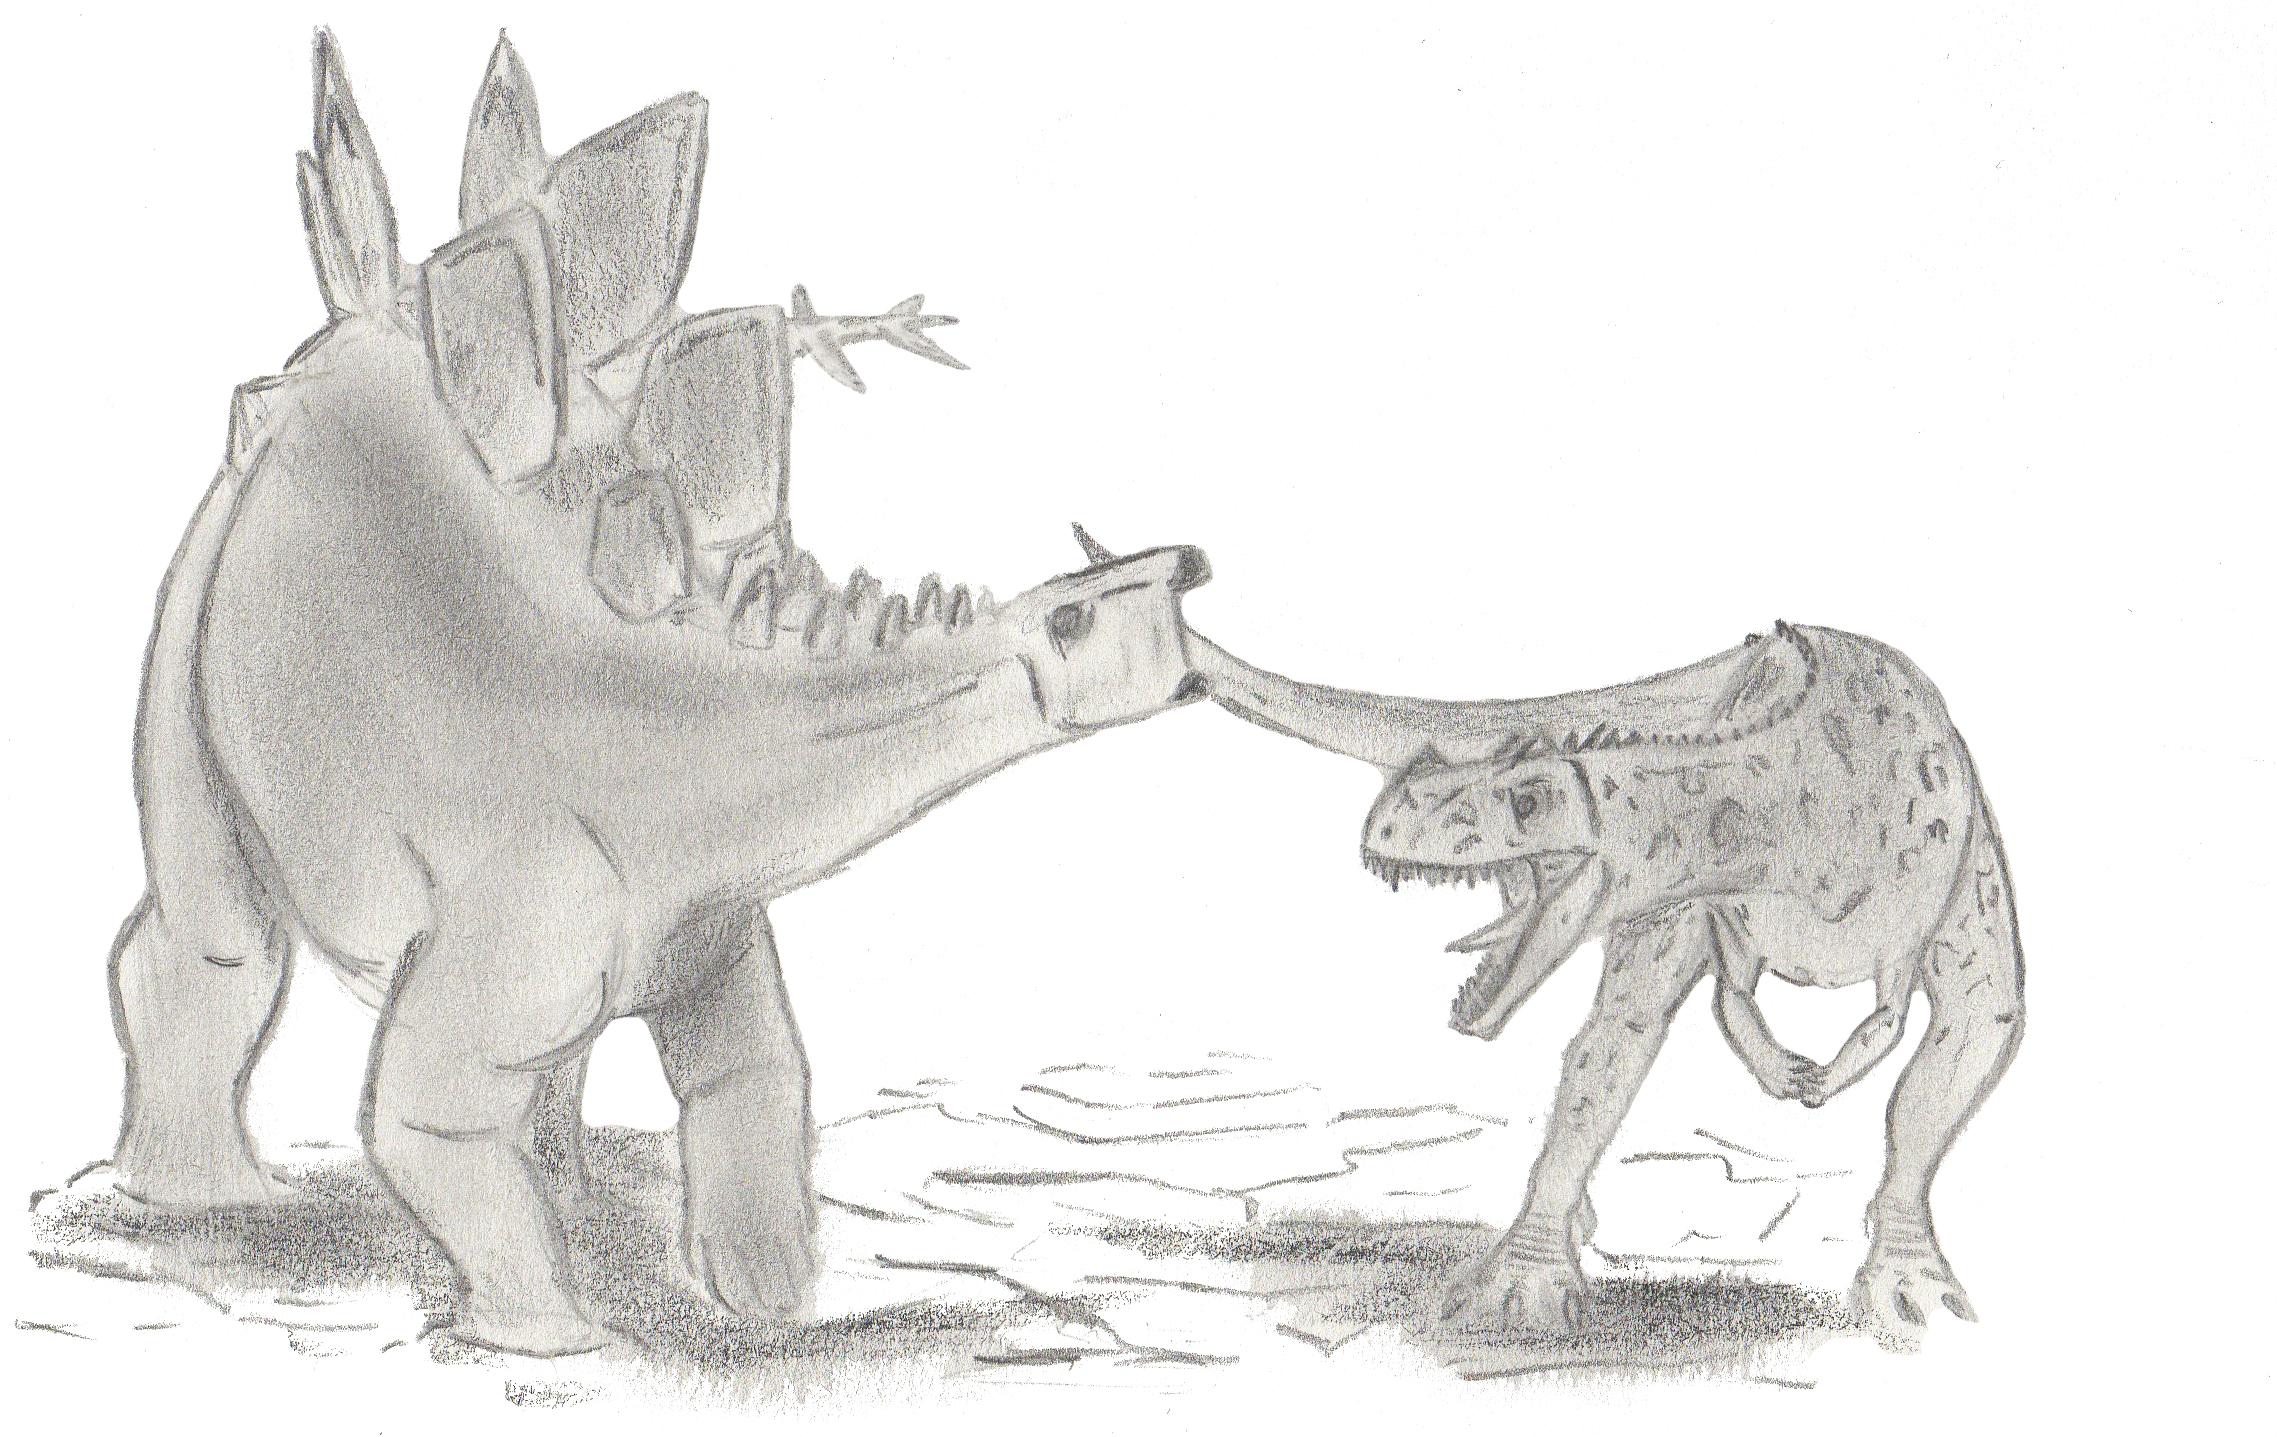 Archivo:Stegosaurus et Ceratosaurus.jpg - Wikipedia, la enciclopedia ...